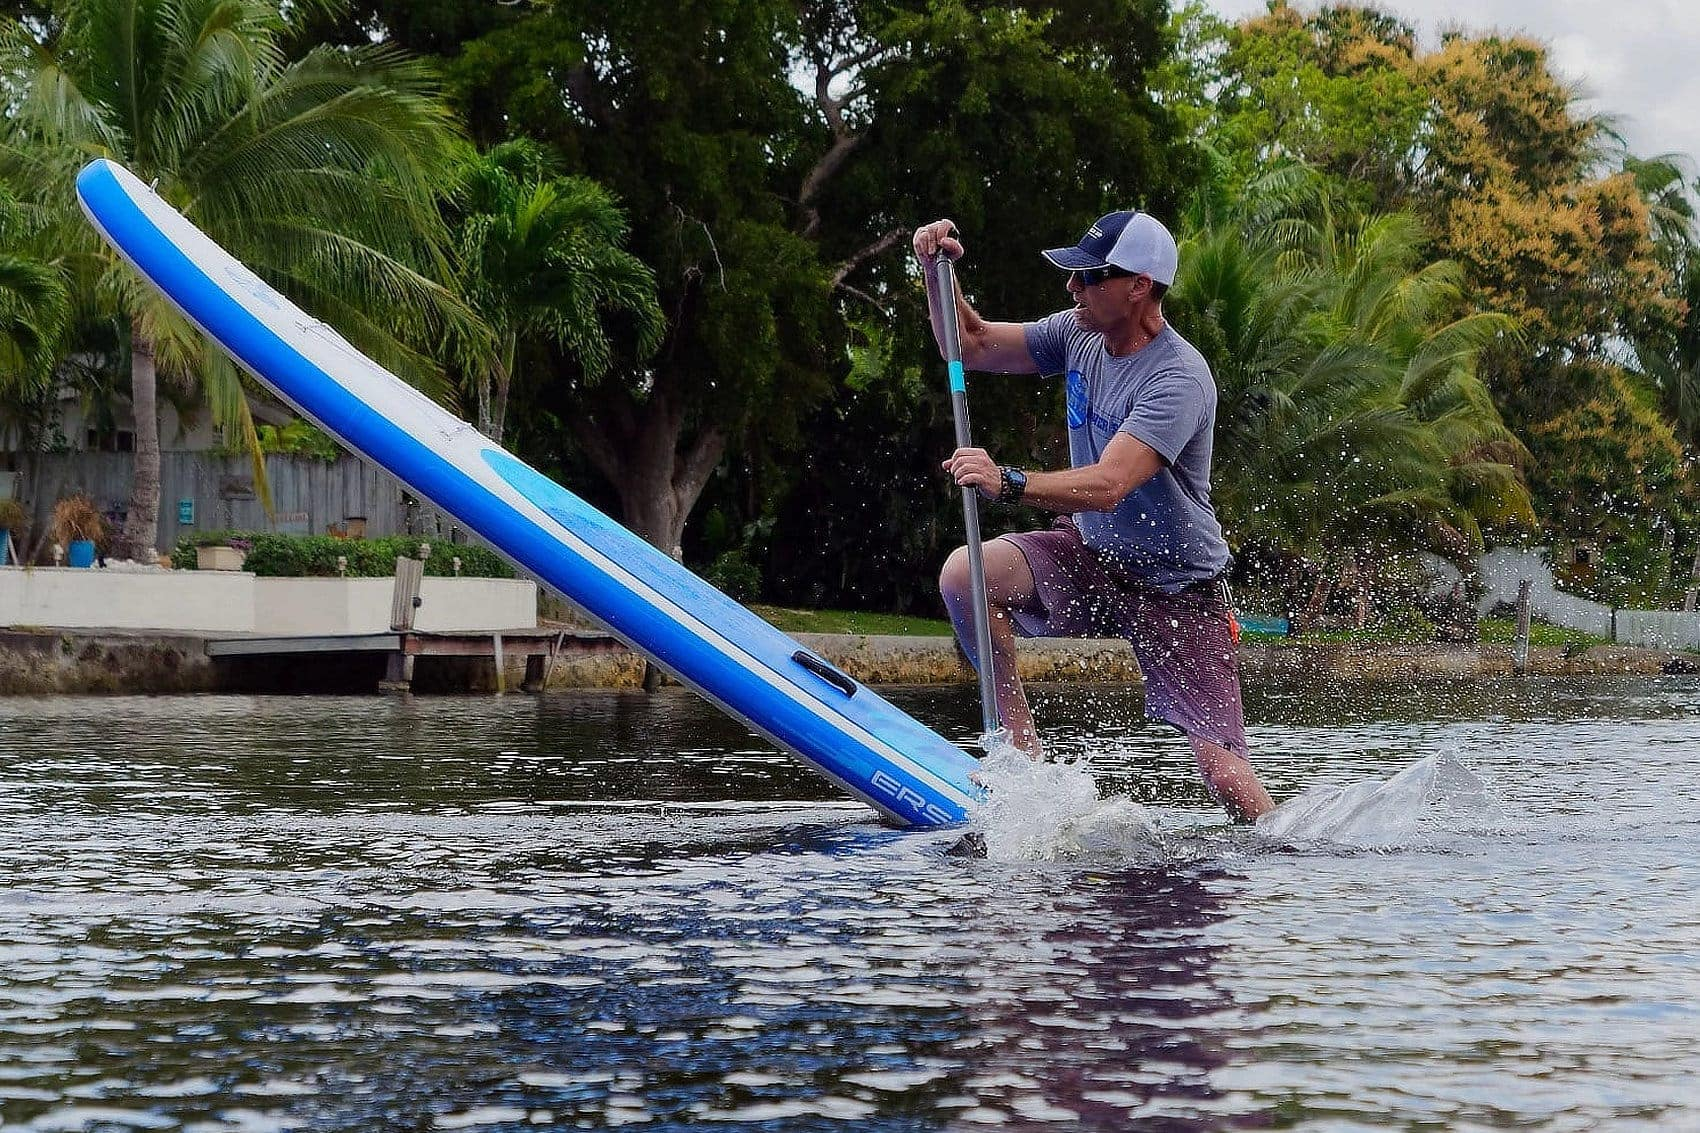 2019 Earth River SUP 11-2 SKYLAKE GT Board